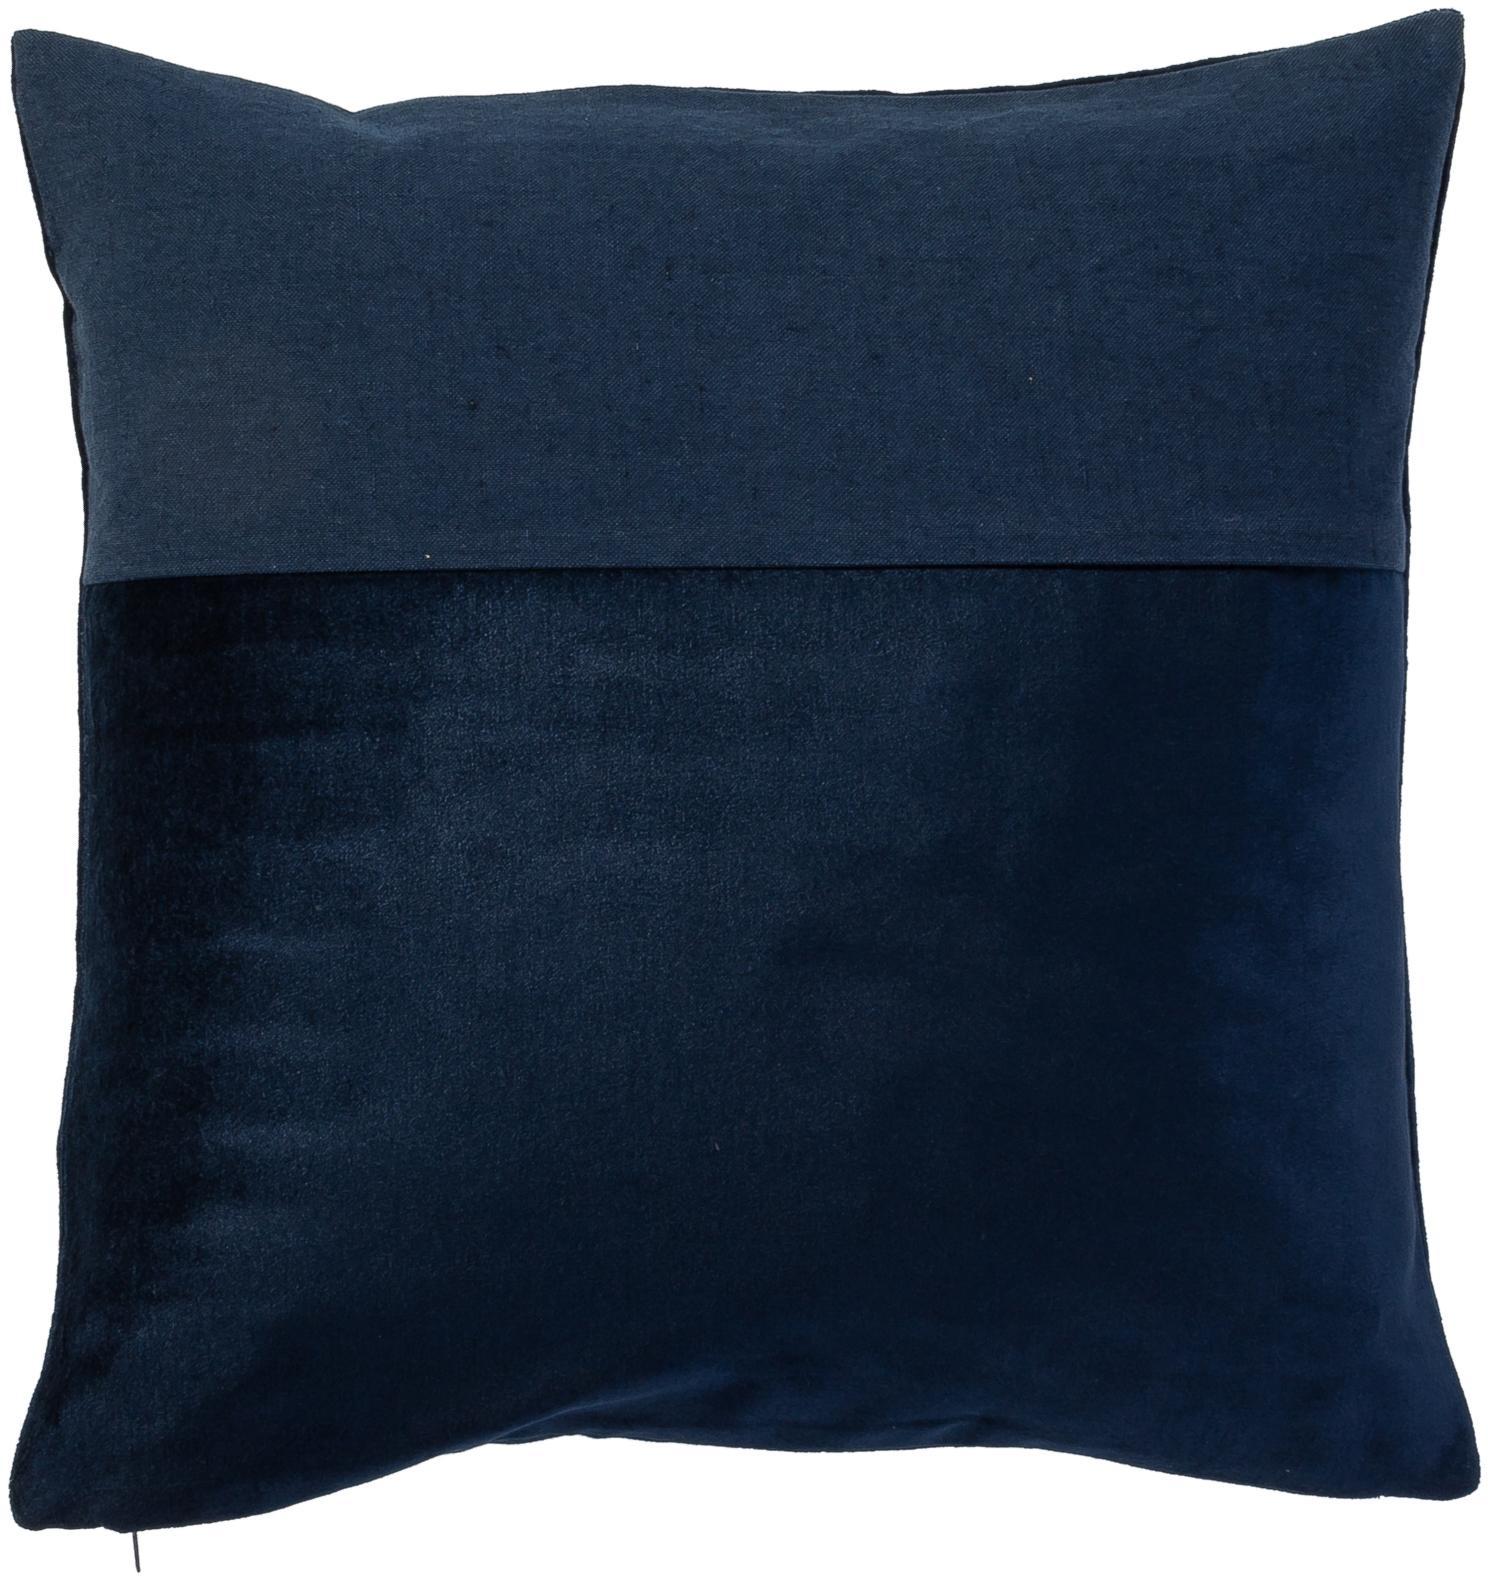 Funda de cojín de terciopelo y lino Adelaide, Parte superior: 50%algodón, 50%lino, Azul oscuro, An 40 x L 40 cm